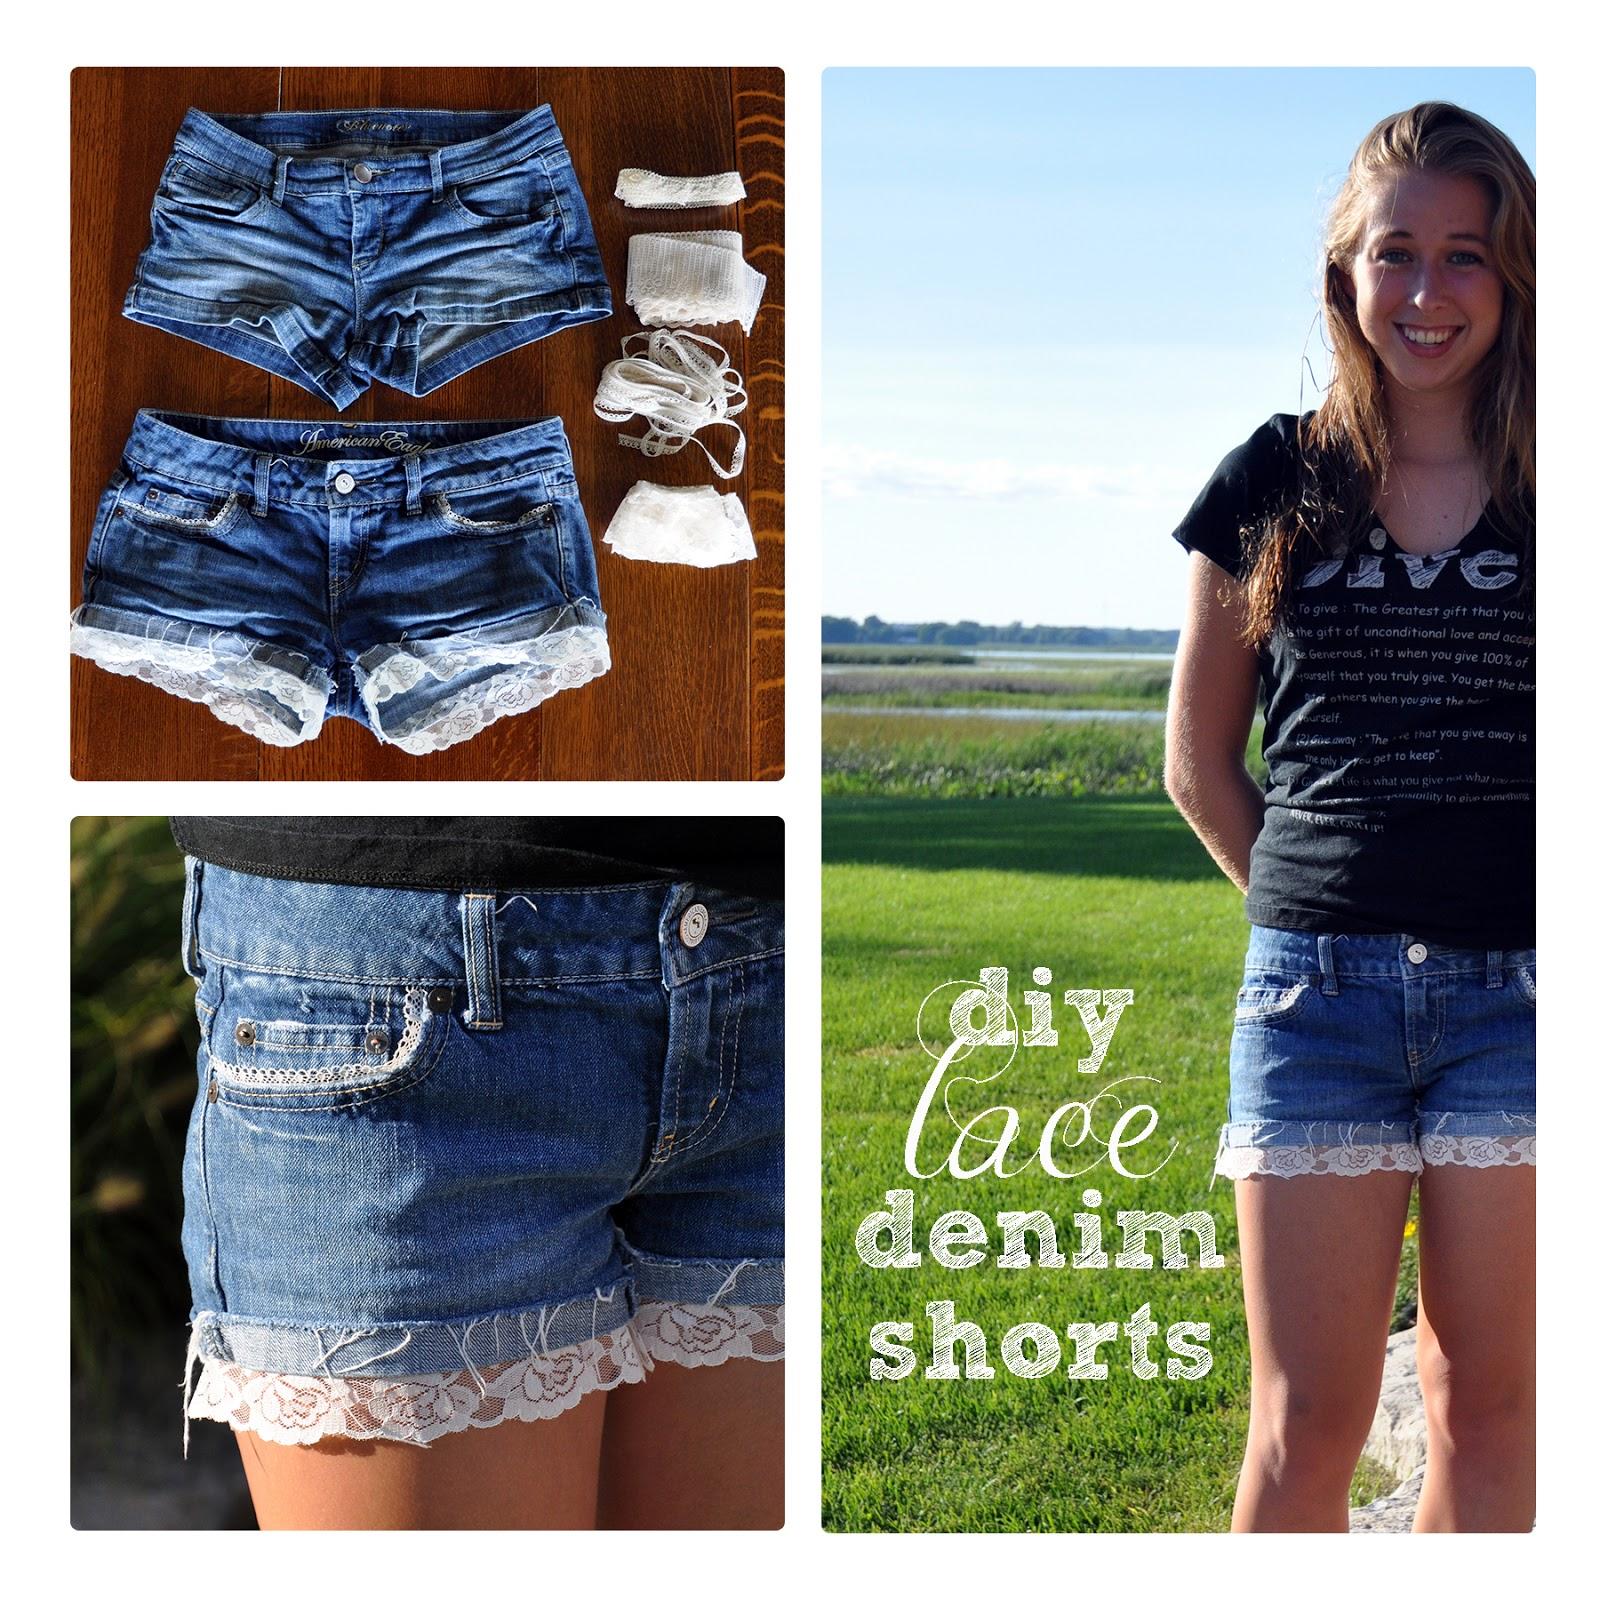 Diy shorts lace denim